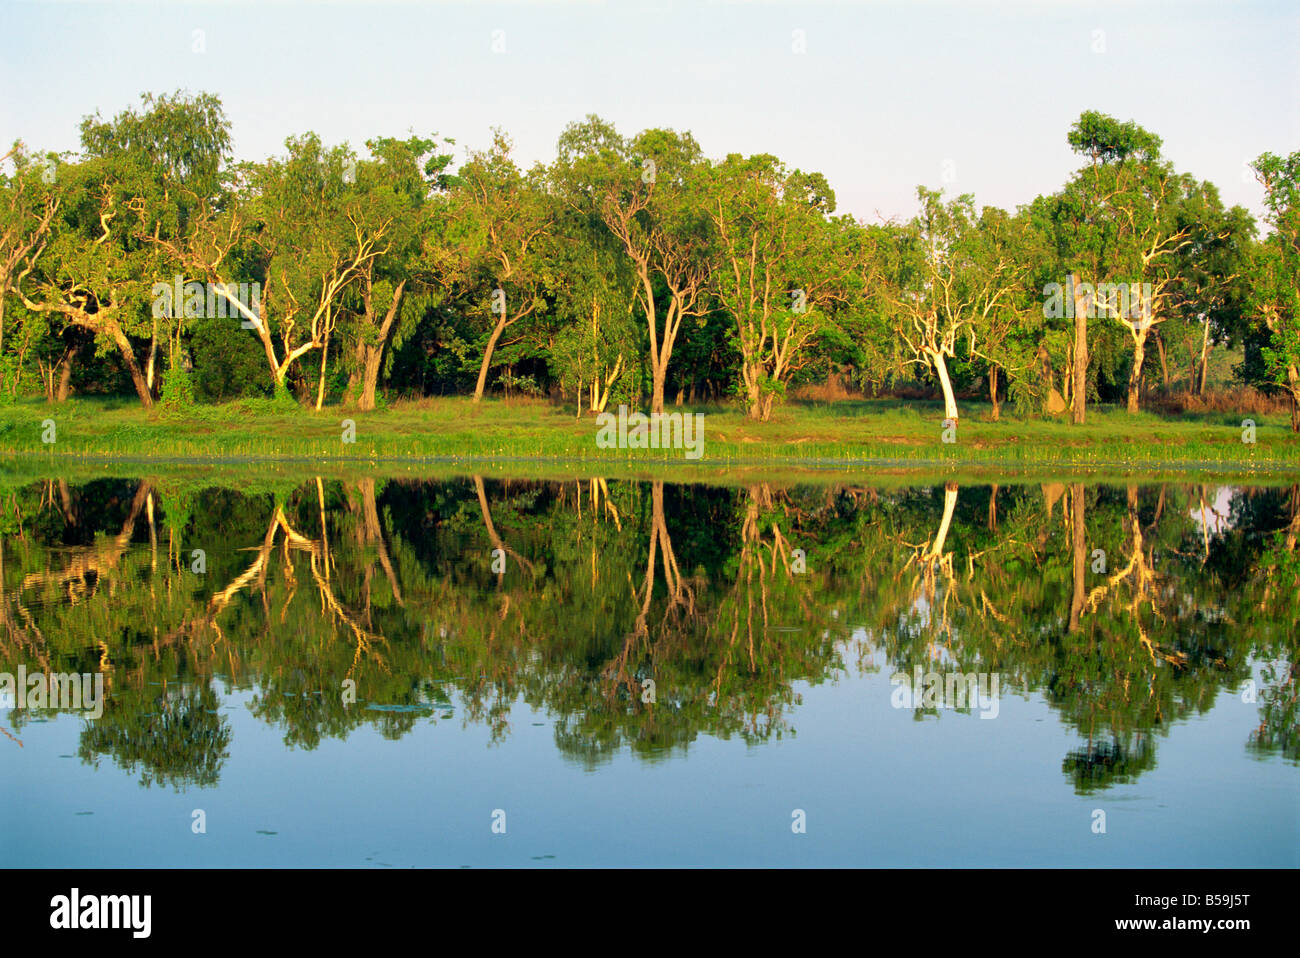 Reflections of eucalyptus trees on Annaburroo Billabong the Arnhem Highway at the Mary River Crossing, Australia Stock Photo